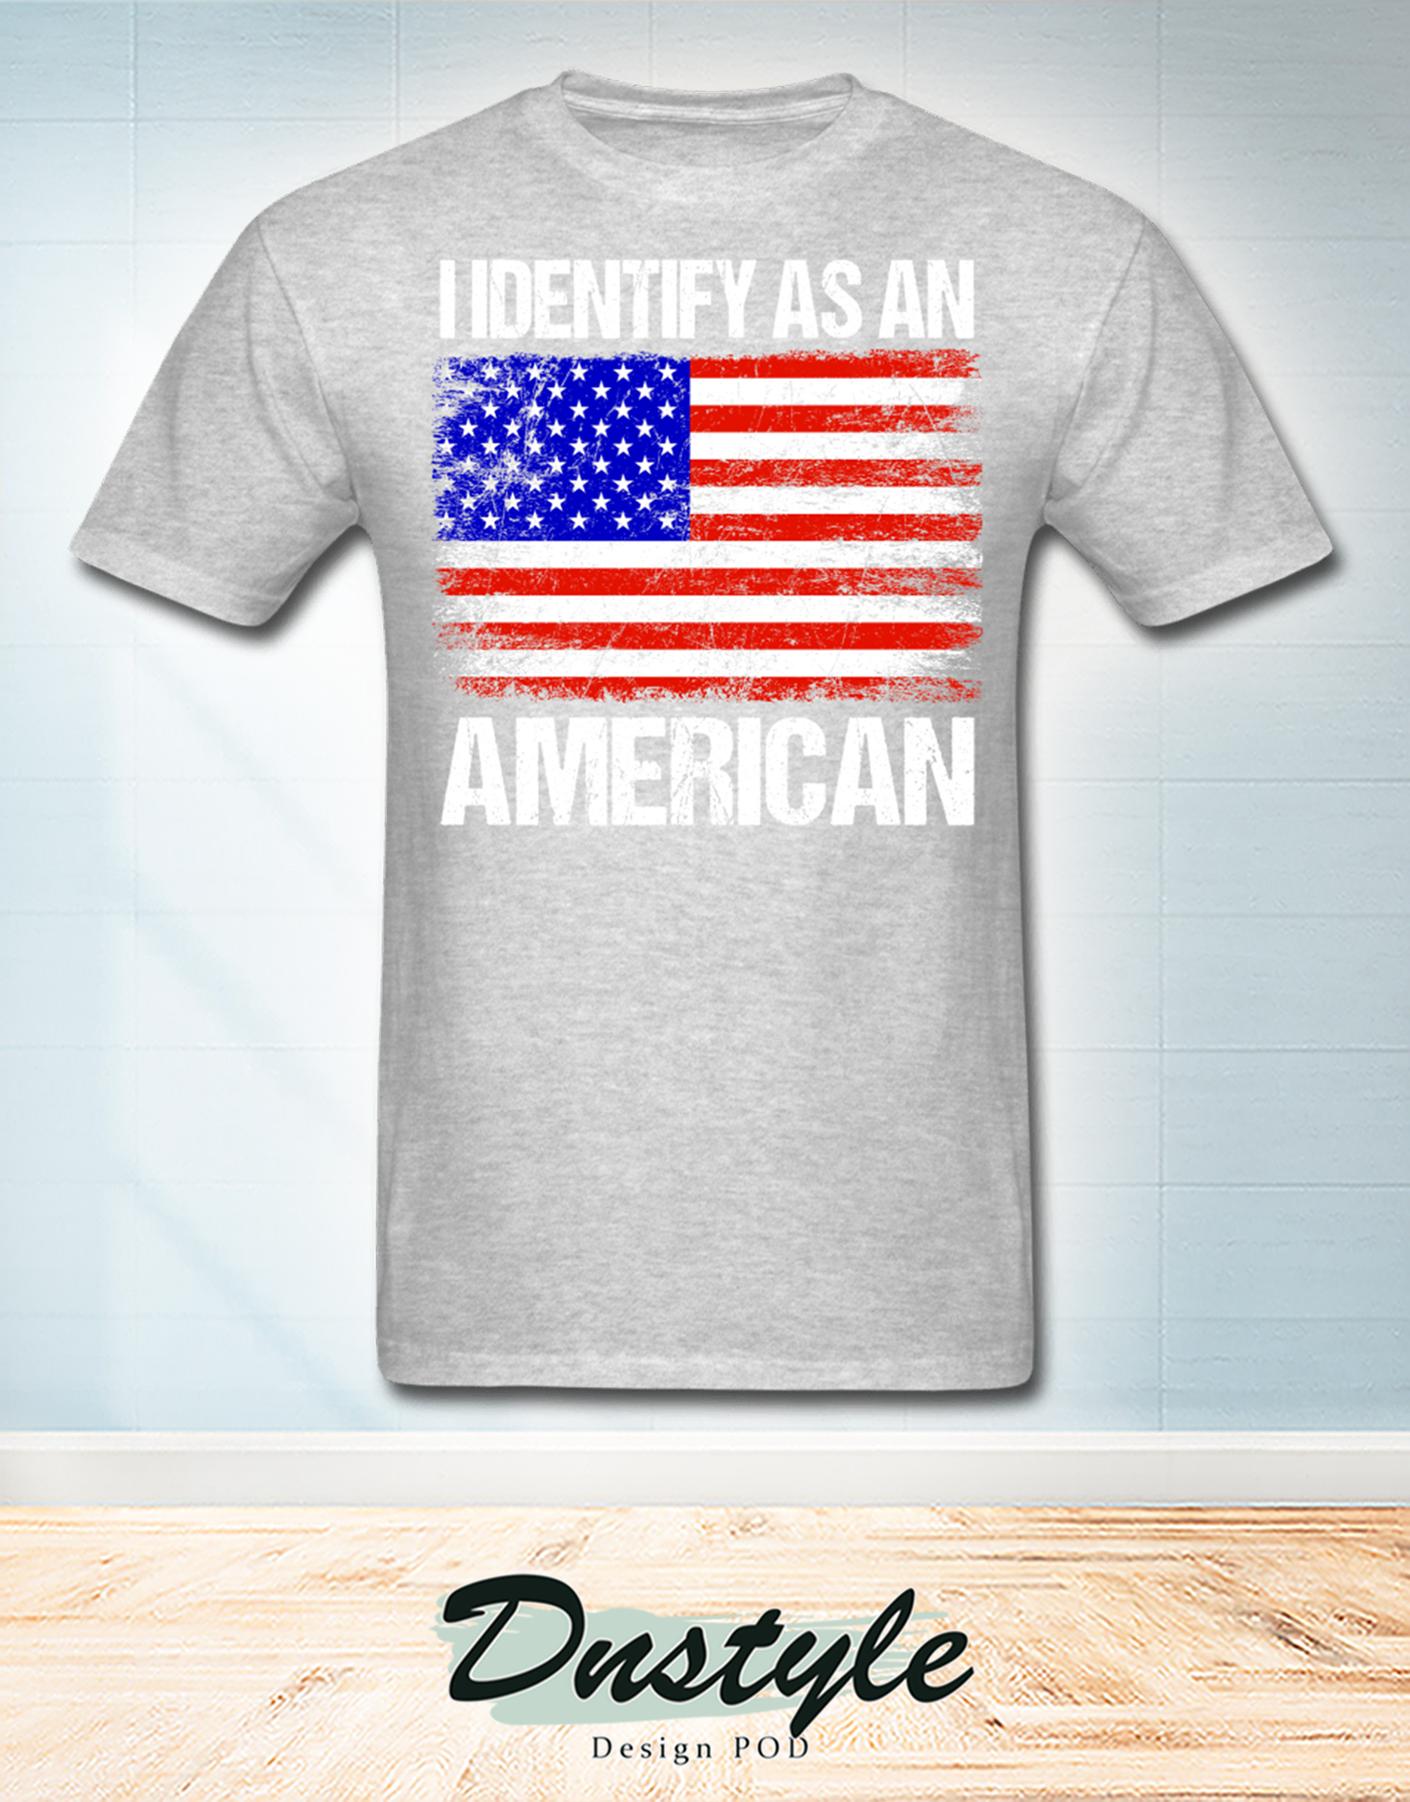 American flag I identify as an american t-shirt 2